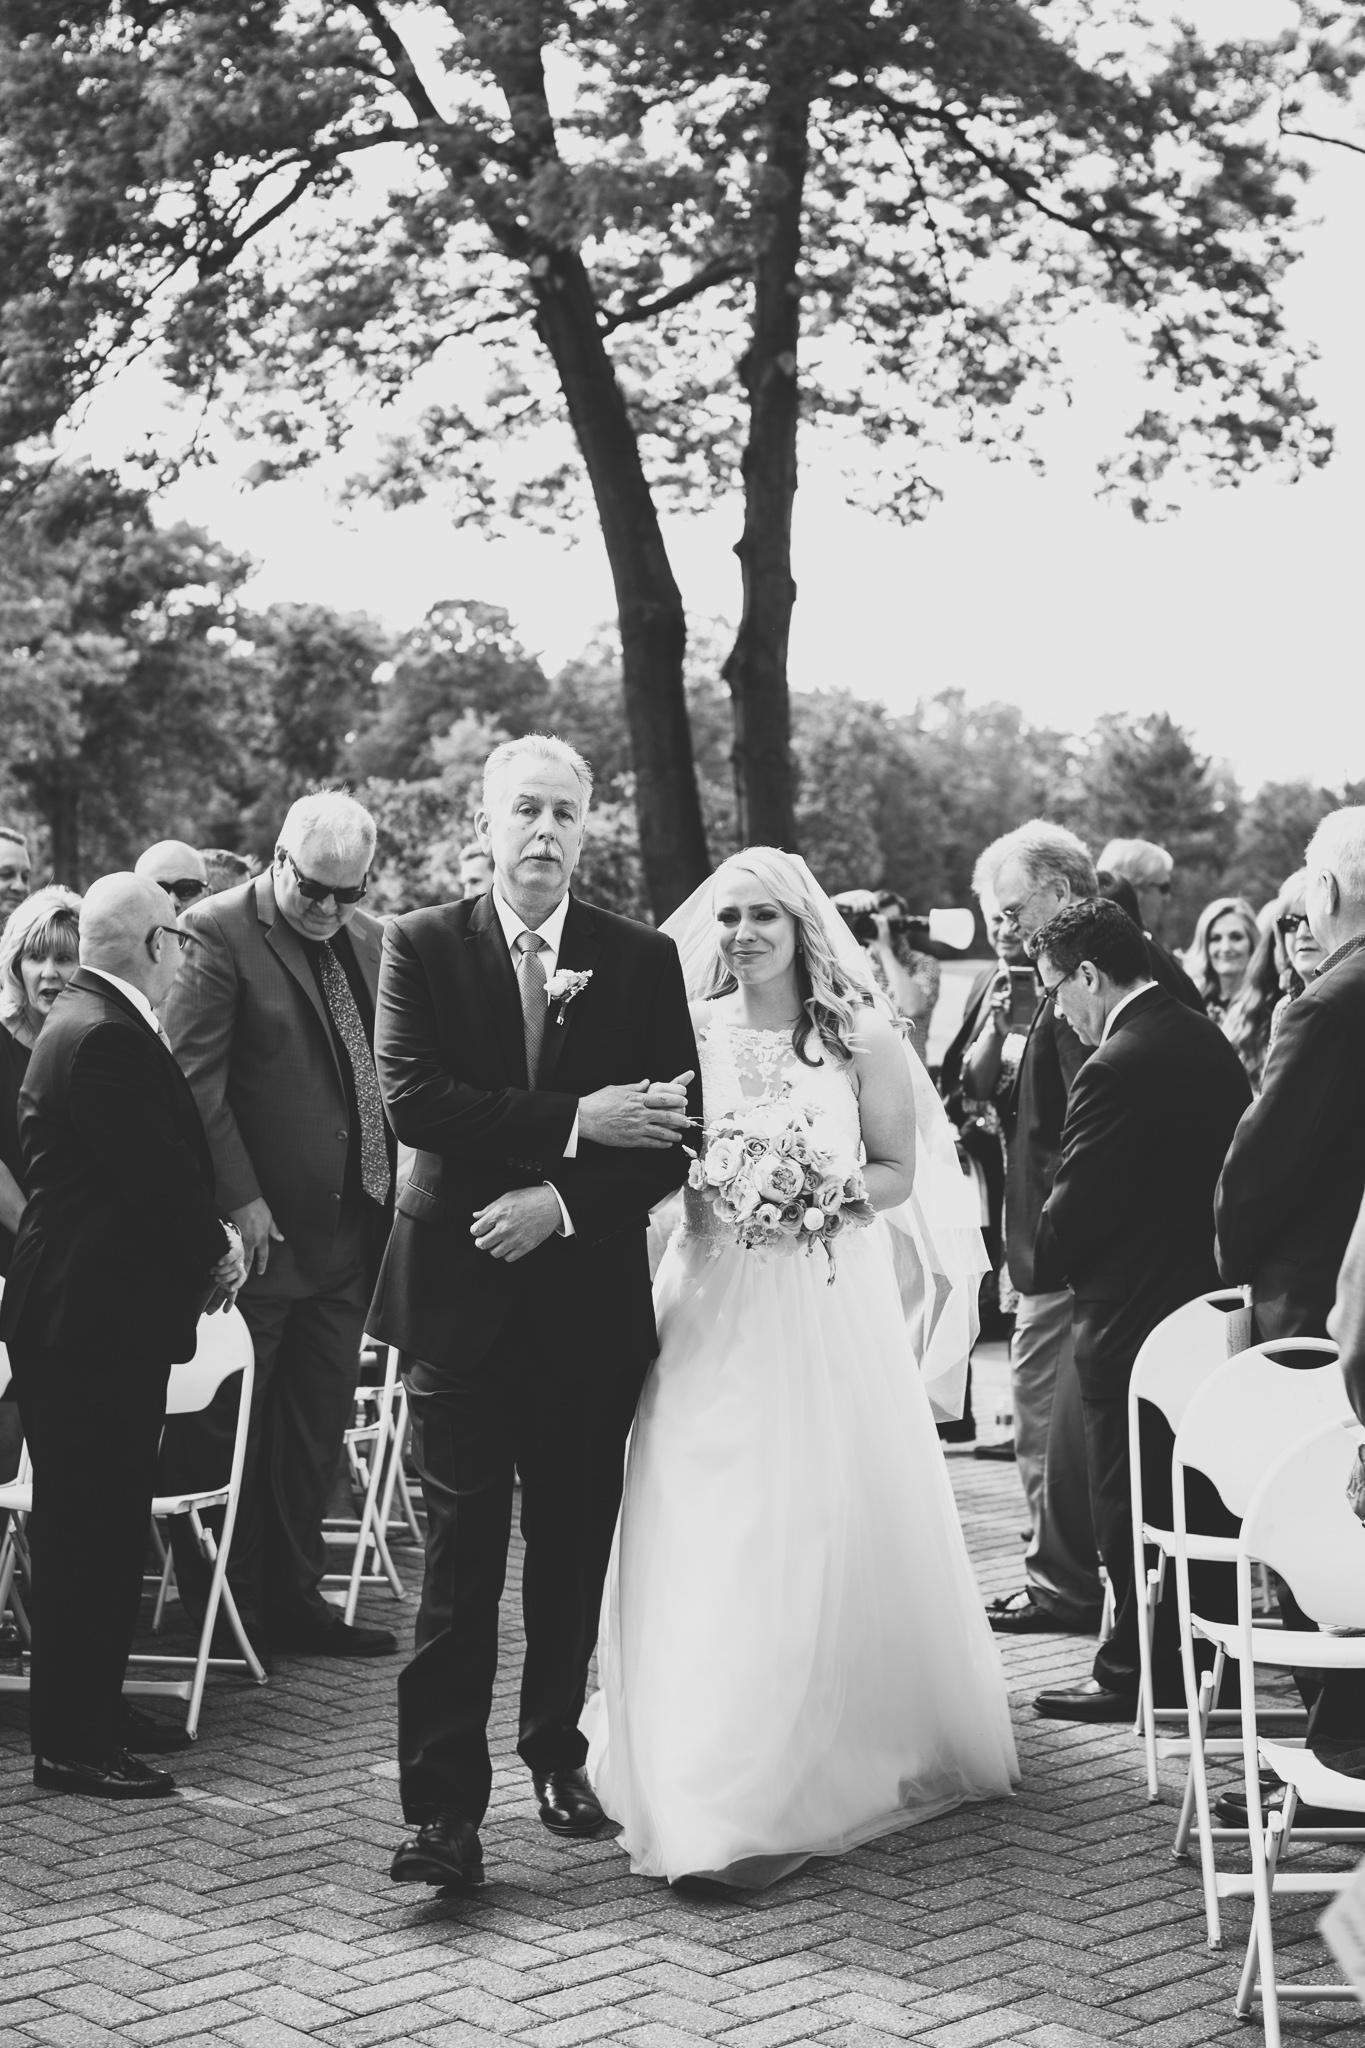 073-best-detroit-michigan-outdoor-wedding-photographer.jpg